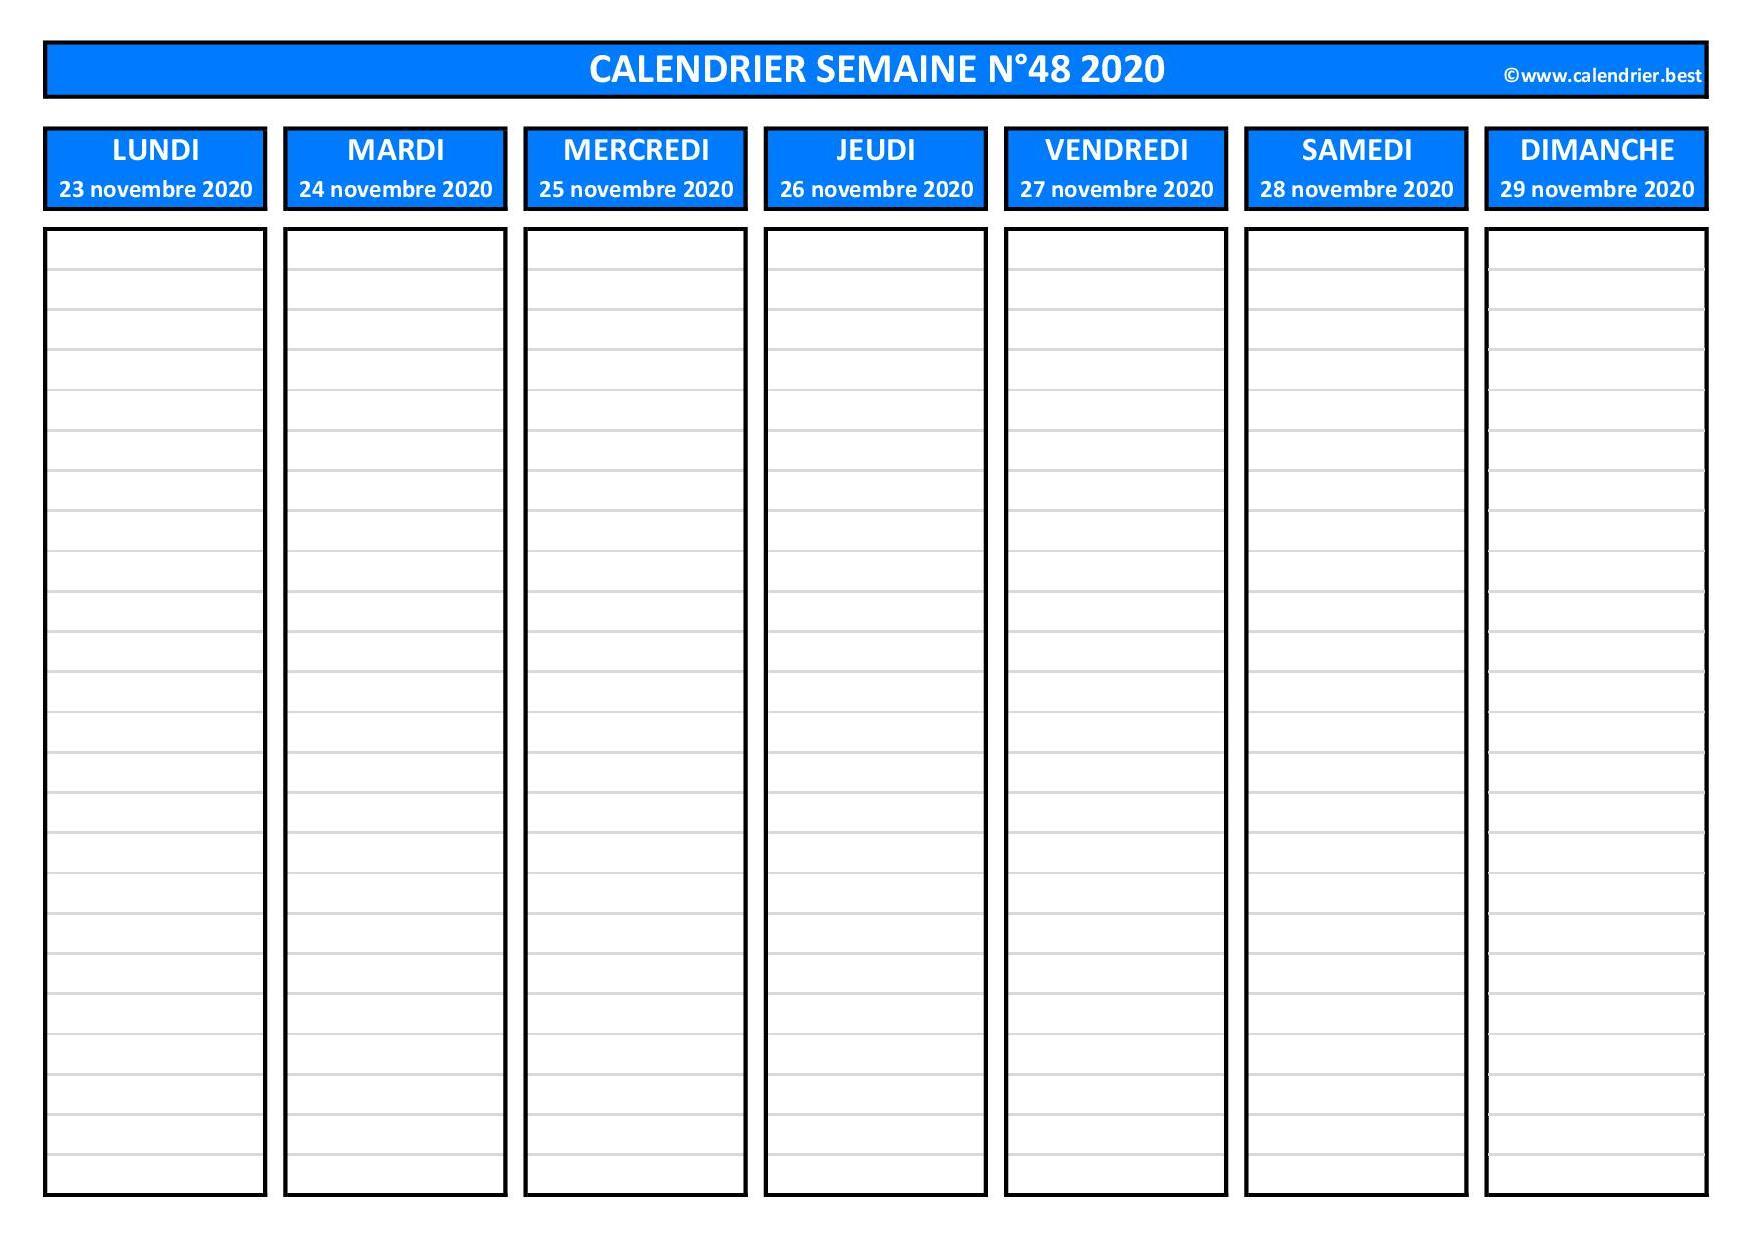 Semaine 48 2020 : dates, calendrier et planning  Calendrier.best